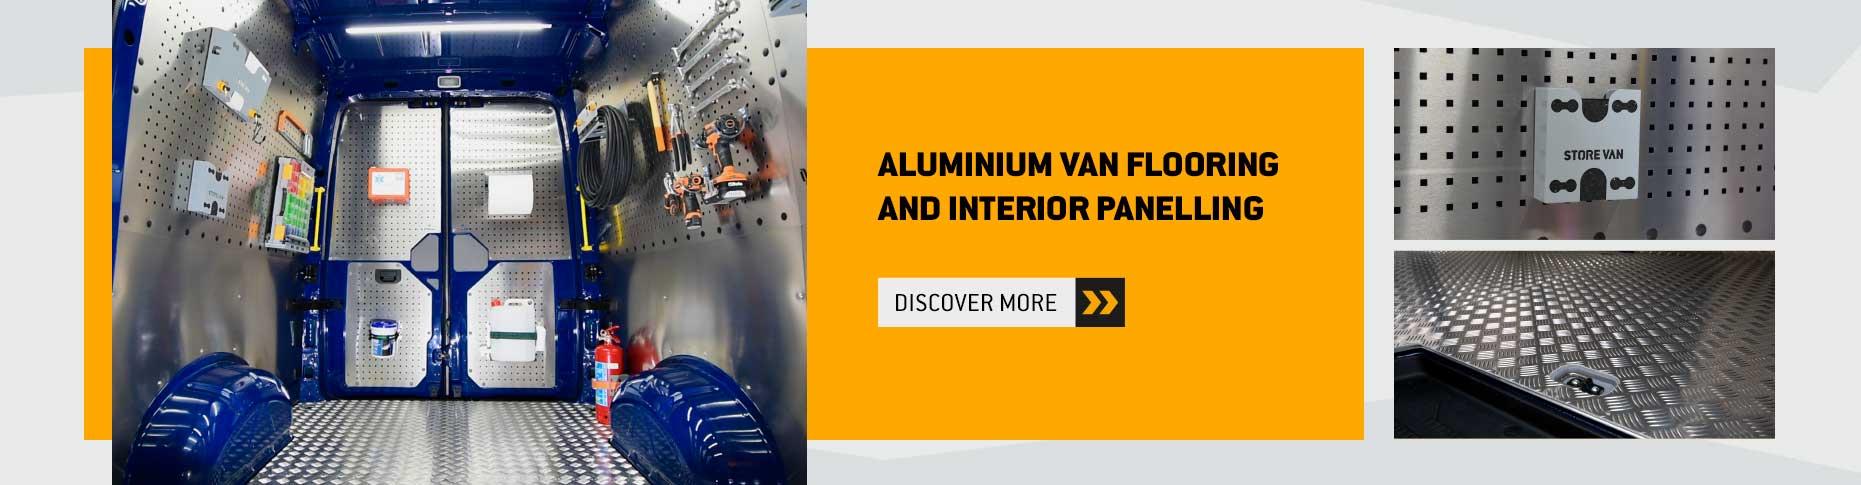 Aluminium van interior lining